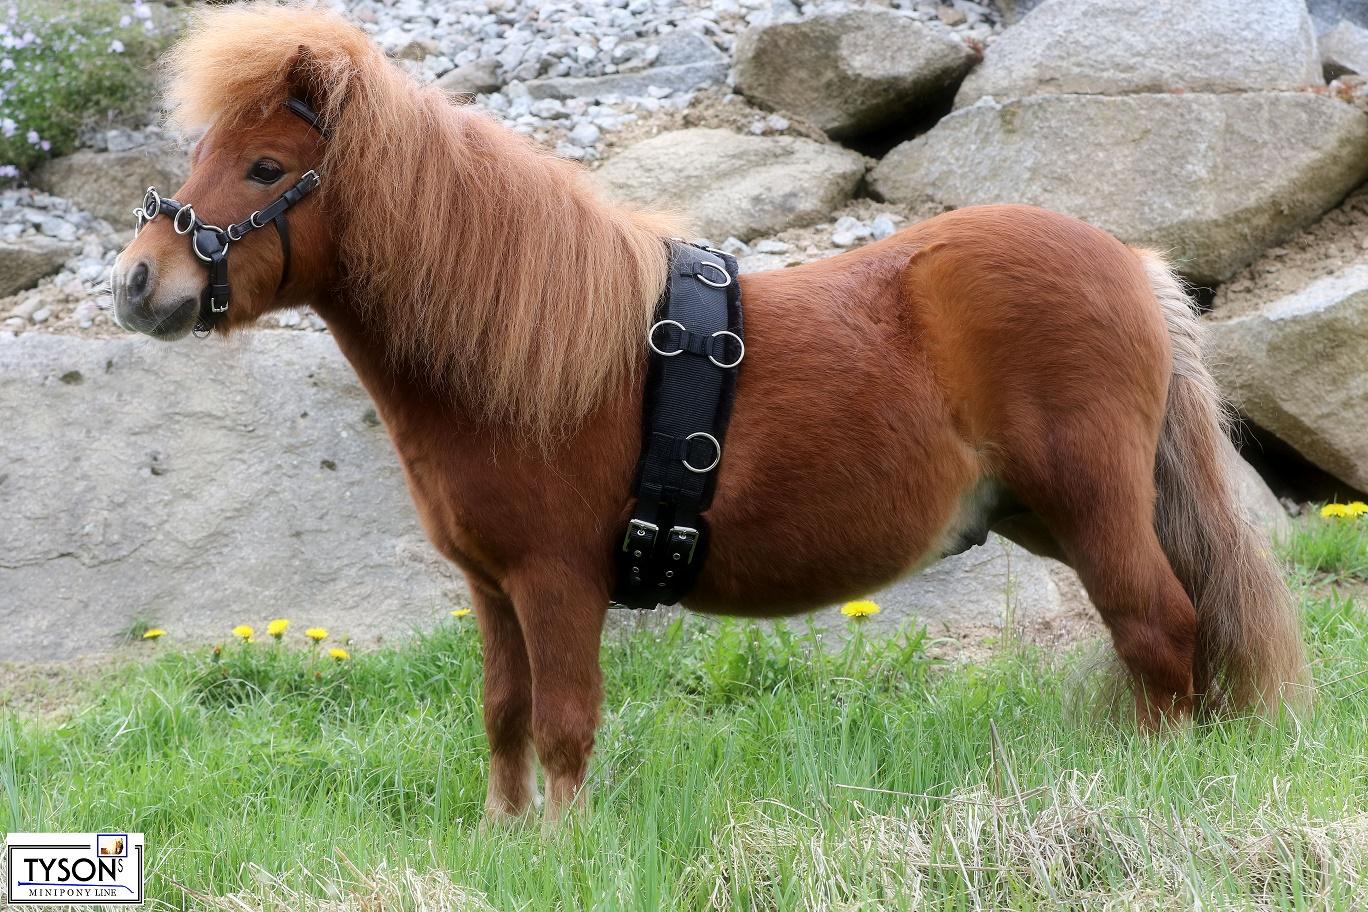 Longiergurt Neon Waldhausen Shetty Pony Kaltblut blau lila Warmblut Cob